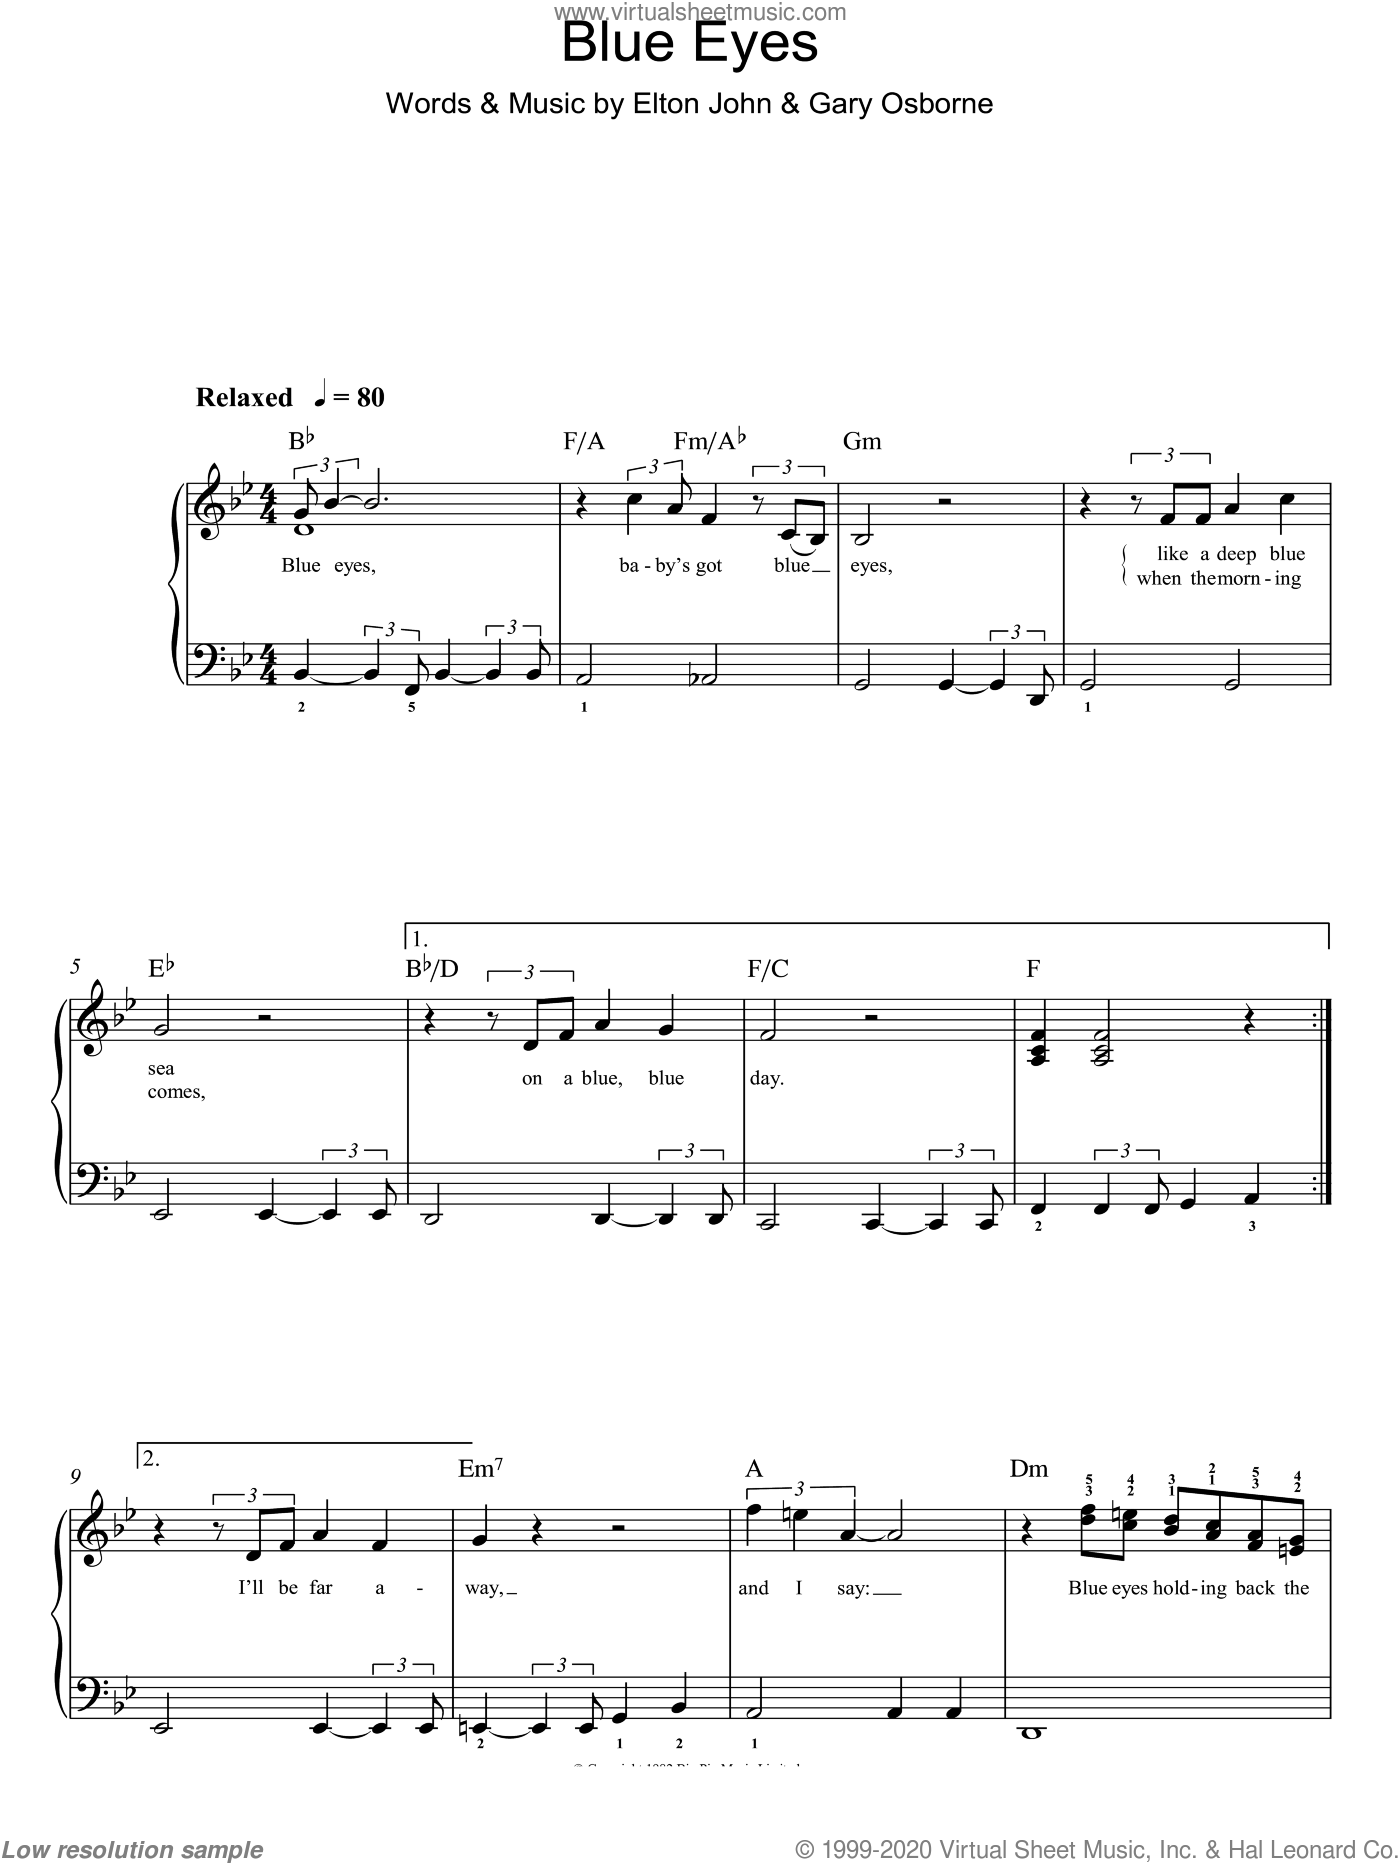 Blue Eyes sheet music for piano solo by Elton John and Gary Osborne, easy skill level